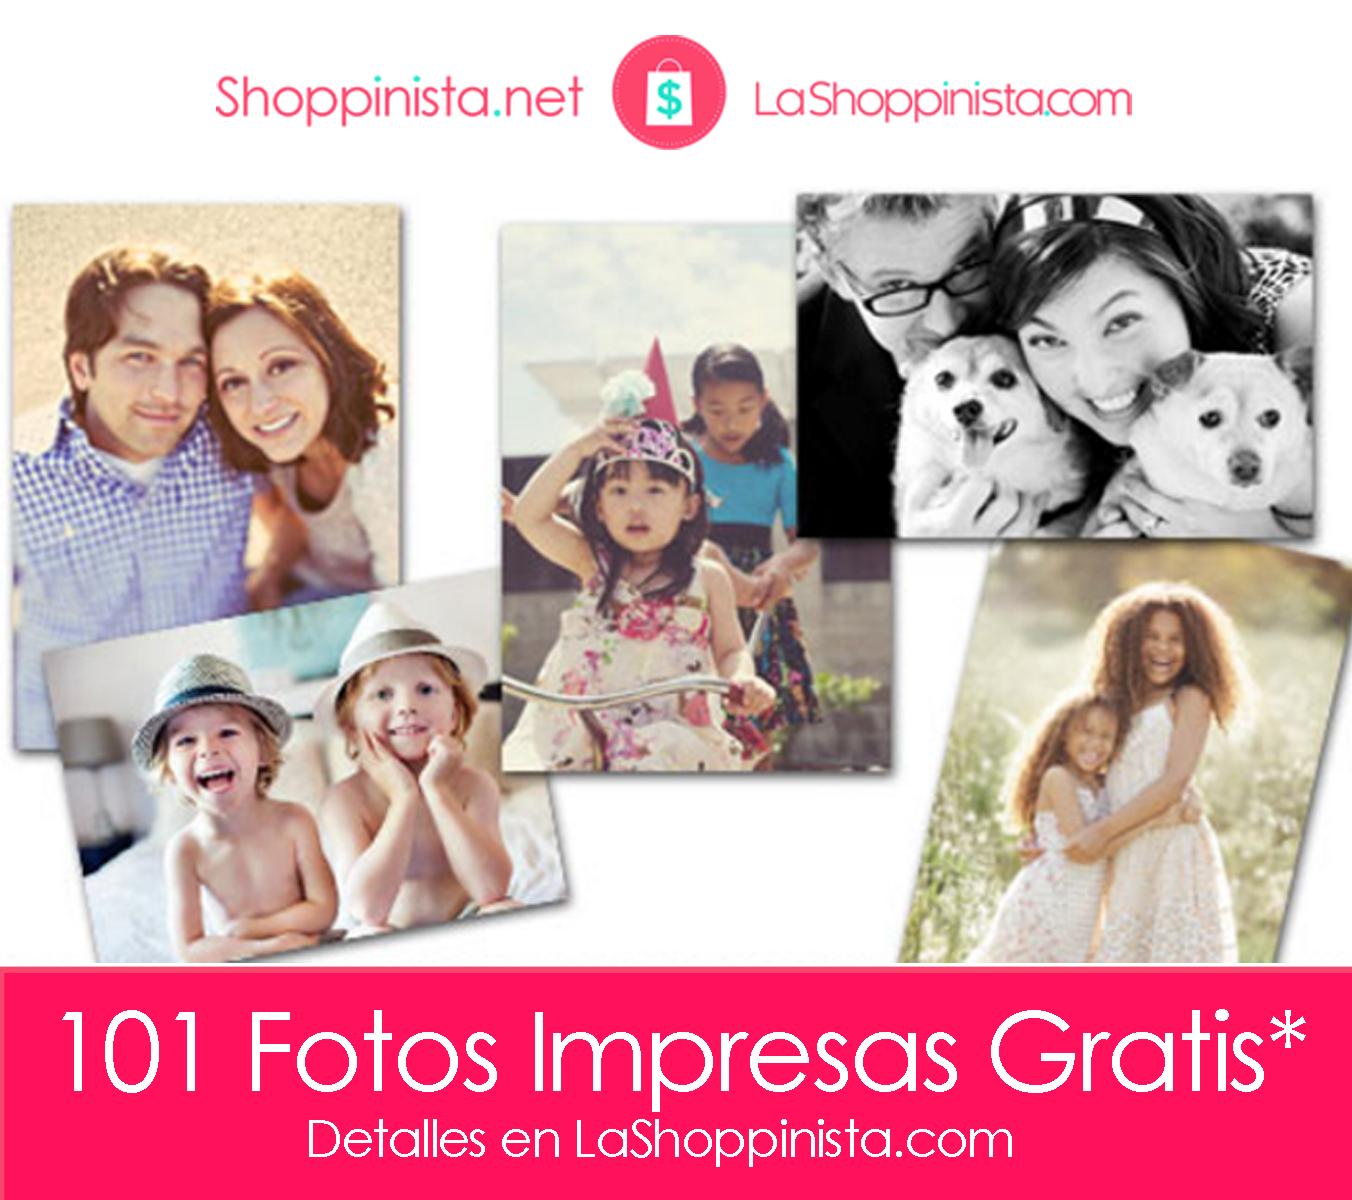 Shutterfly: 101 Free Prints – Fotos Impresas Gratis